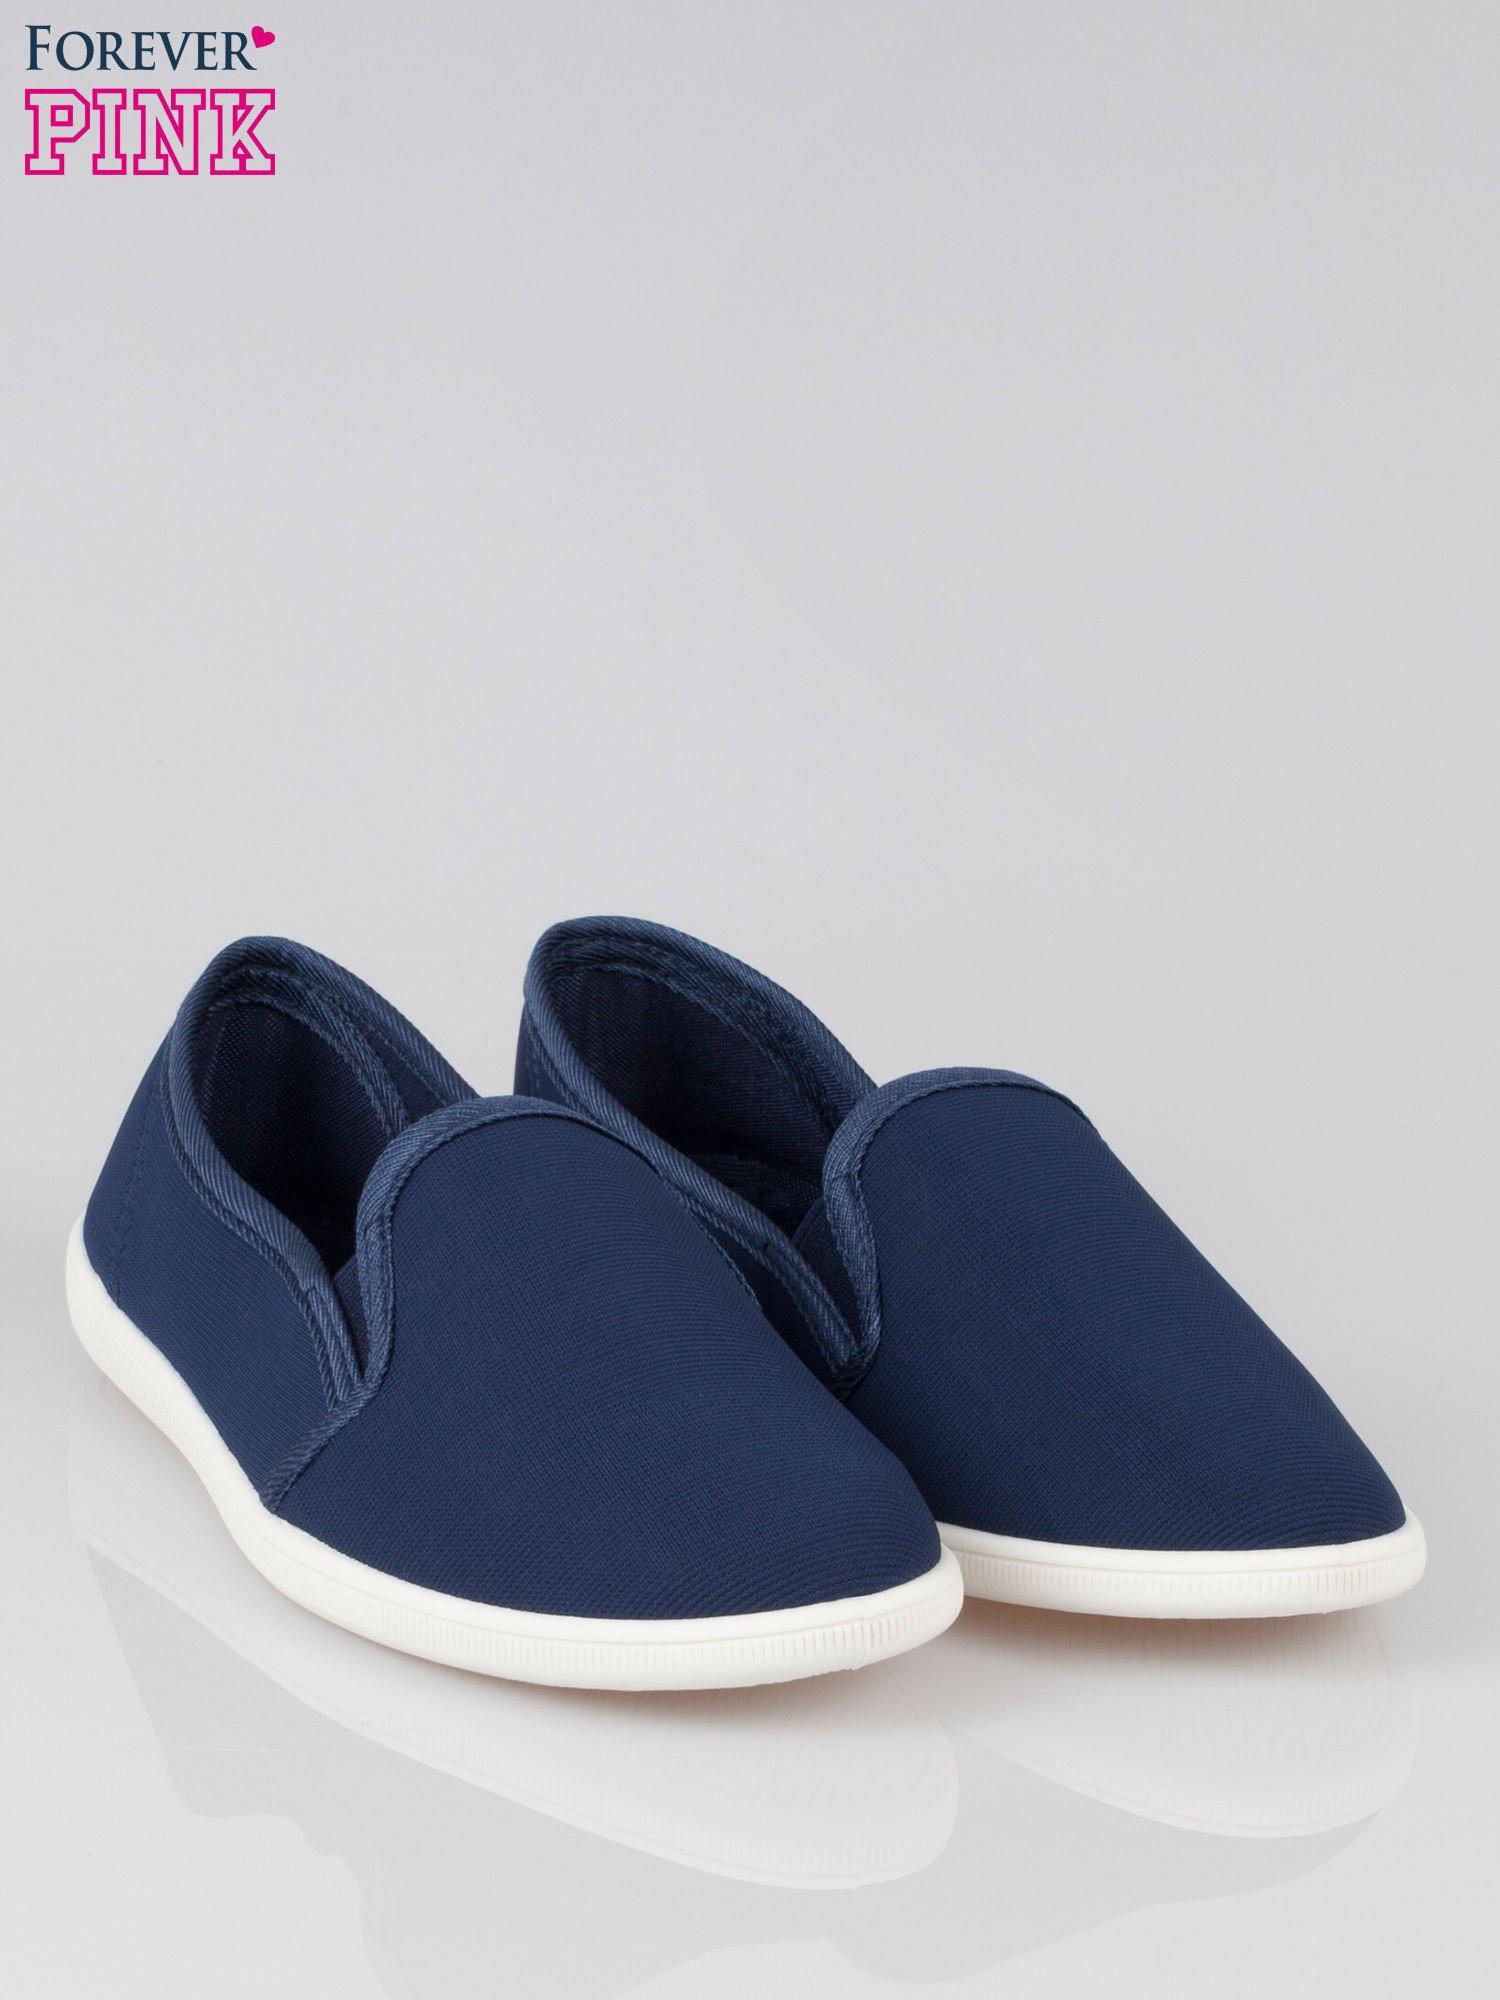 Granatowe lekkie buty sliponki                                  zdj.                                  2